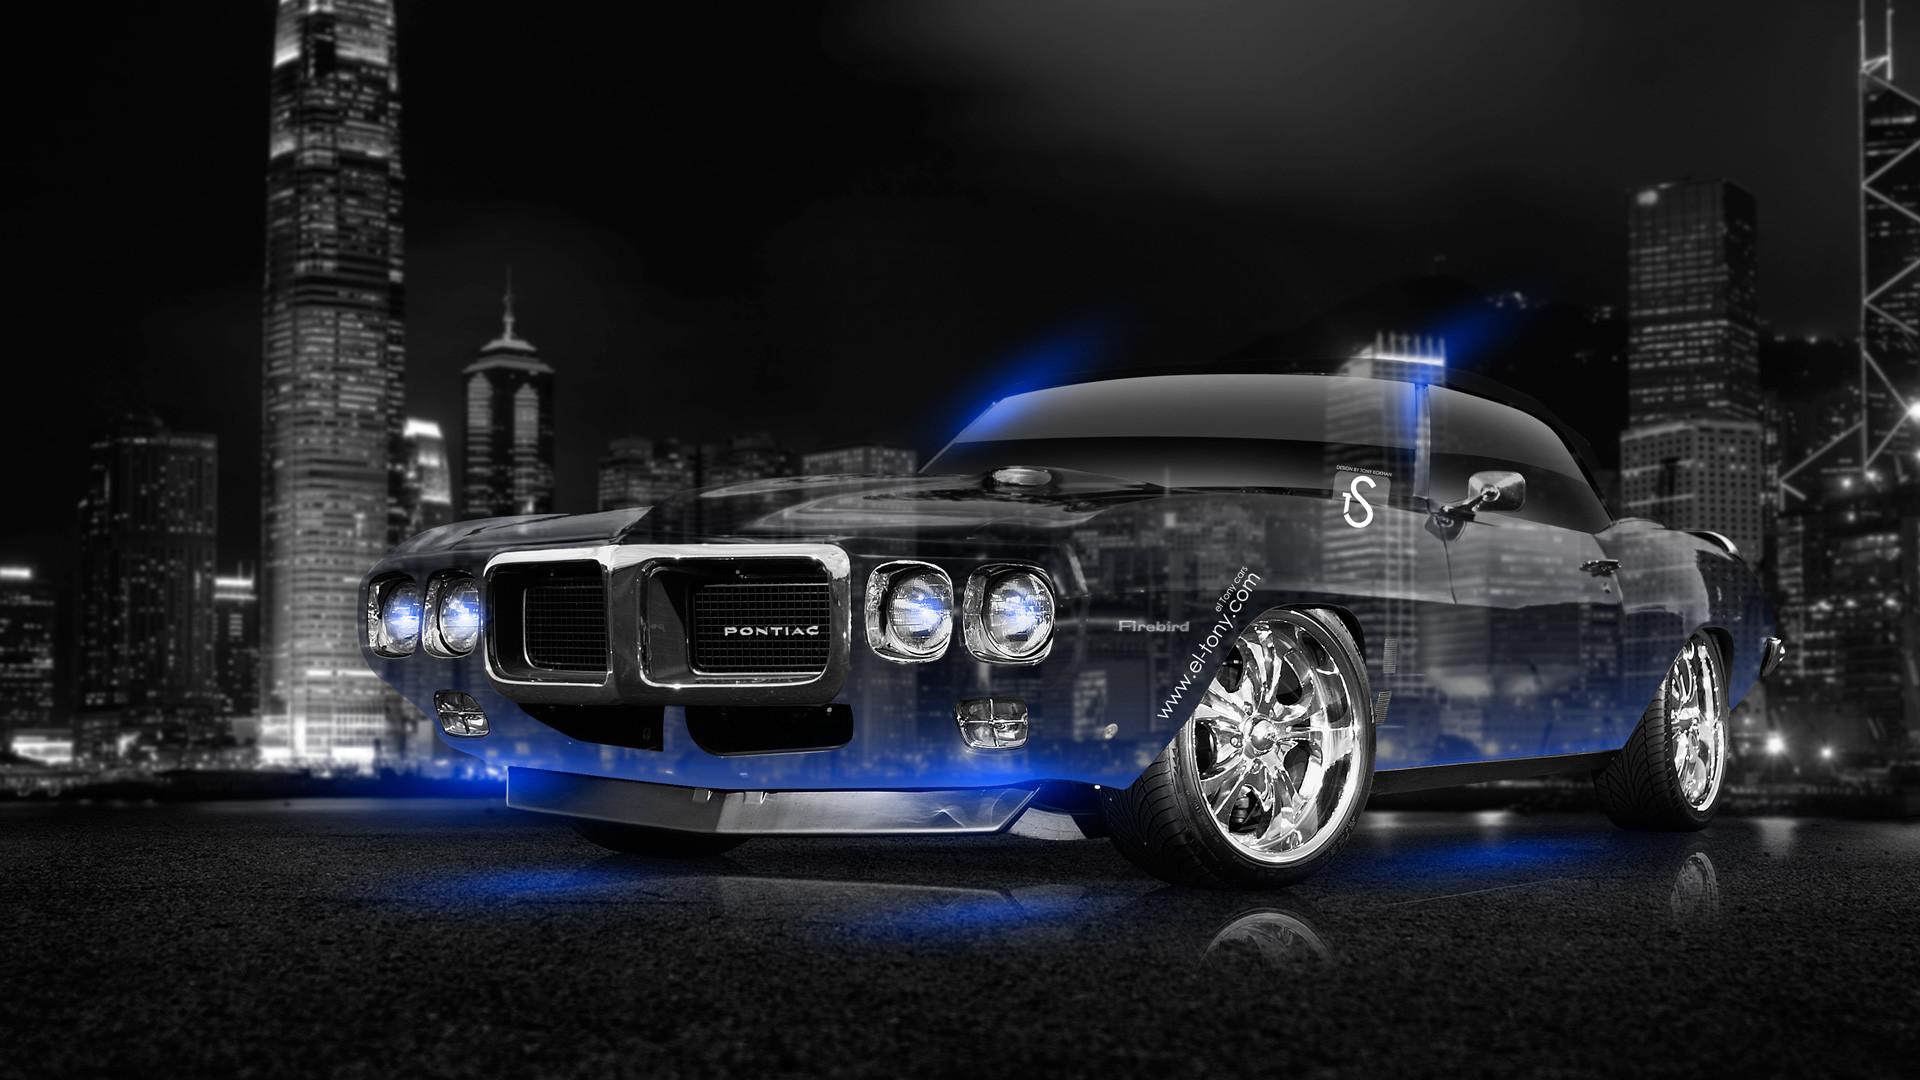 Res: 1920x1080, Pontiac-Firebird-Muscle-Retro-Crystal-City-Car-2014- ...